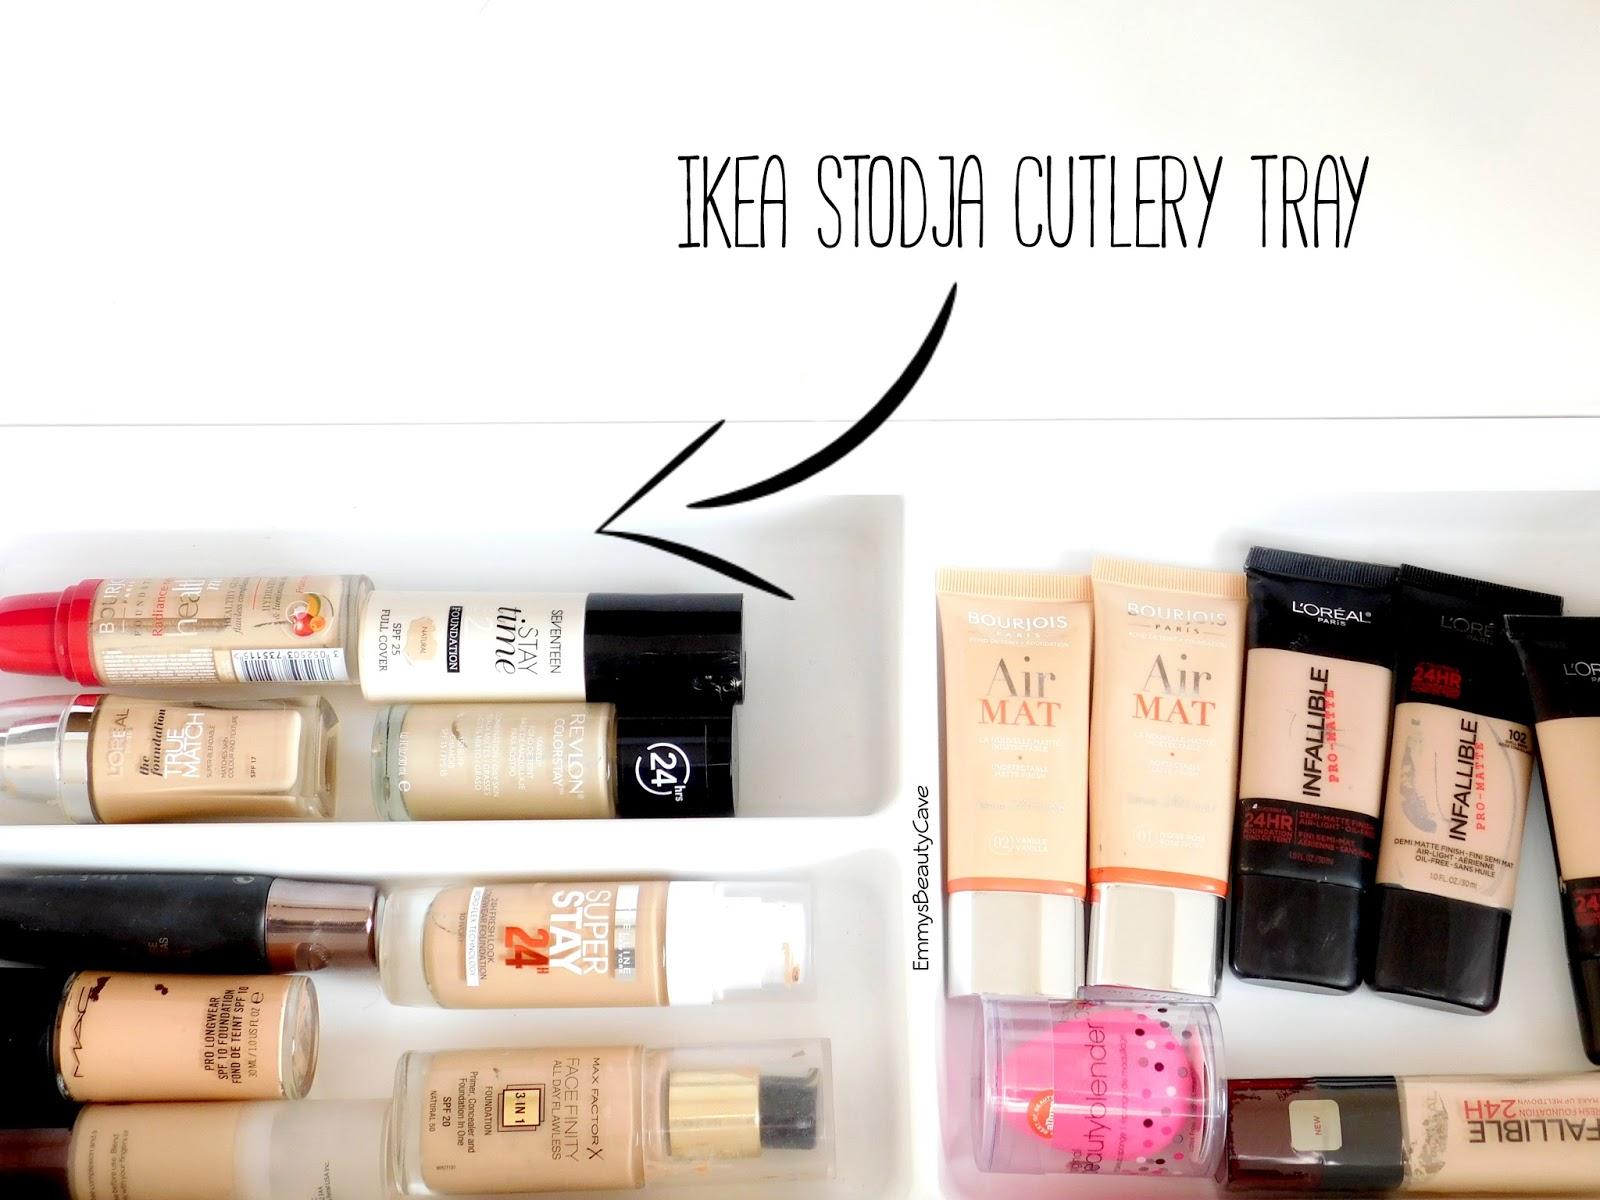 Makeup storage ikea alex drawers and malm dressing table - Malm dressing table drawer organizer ...